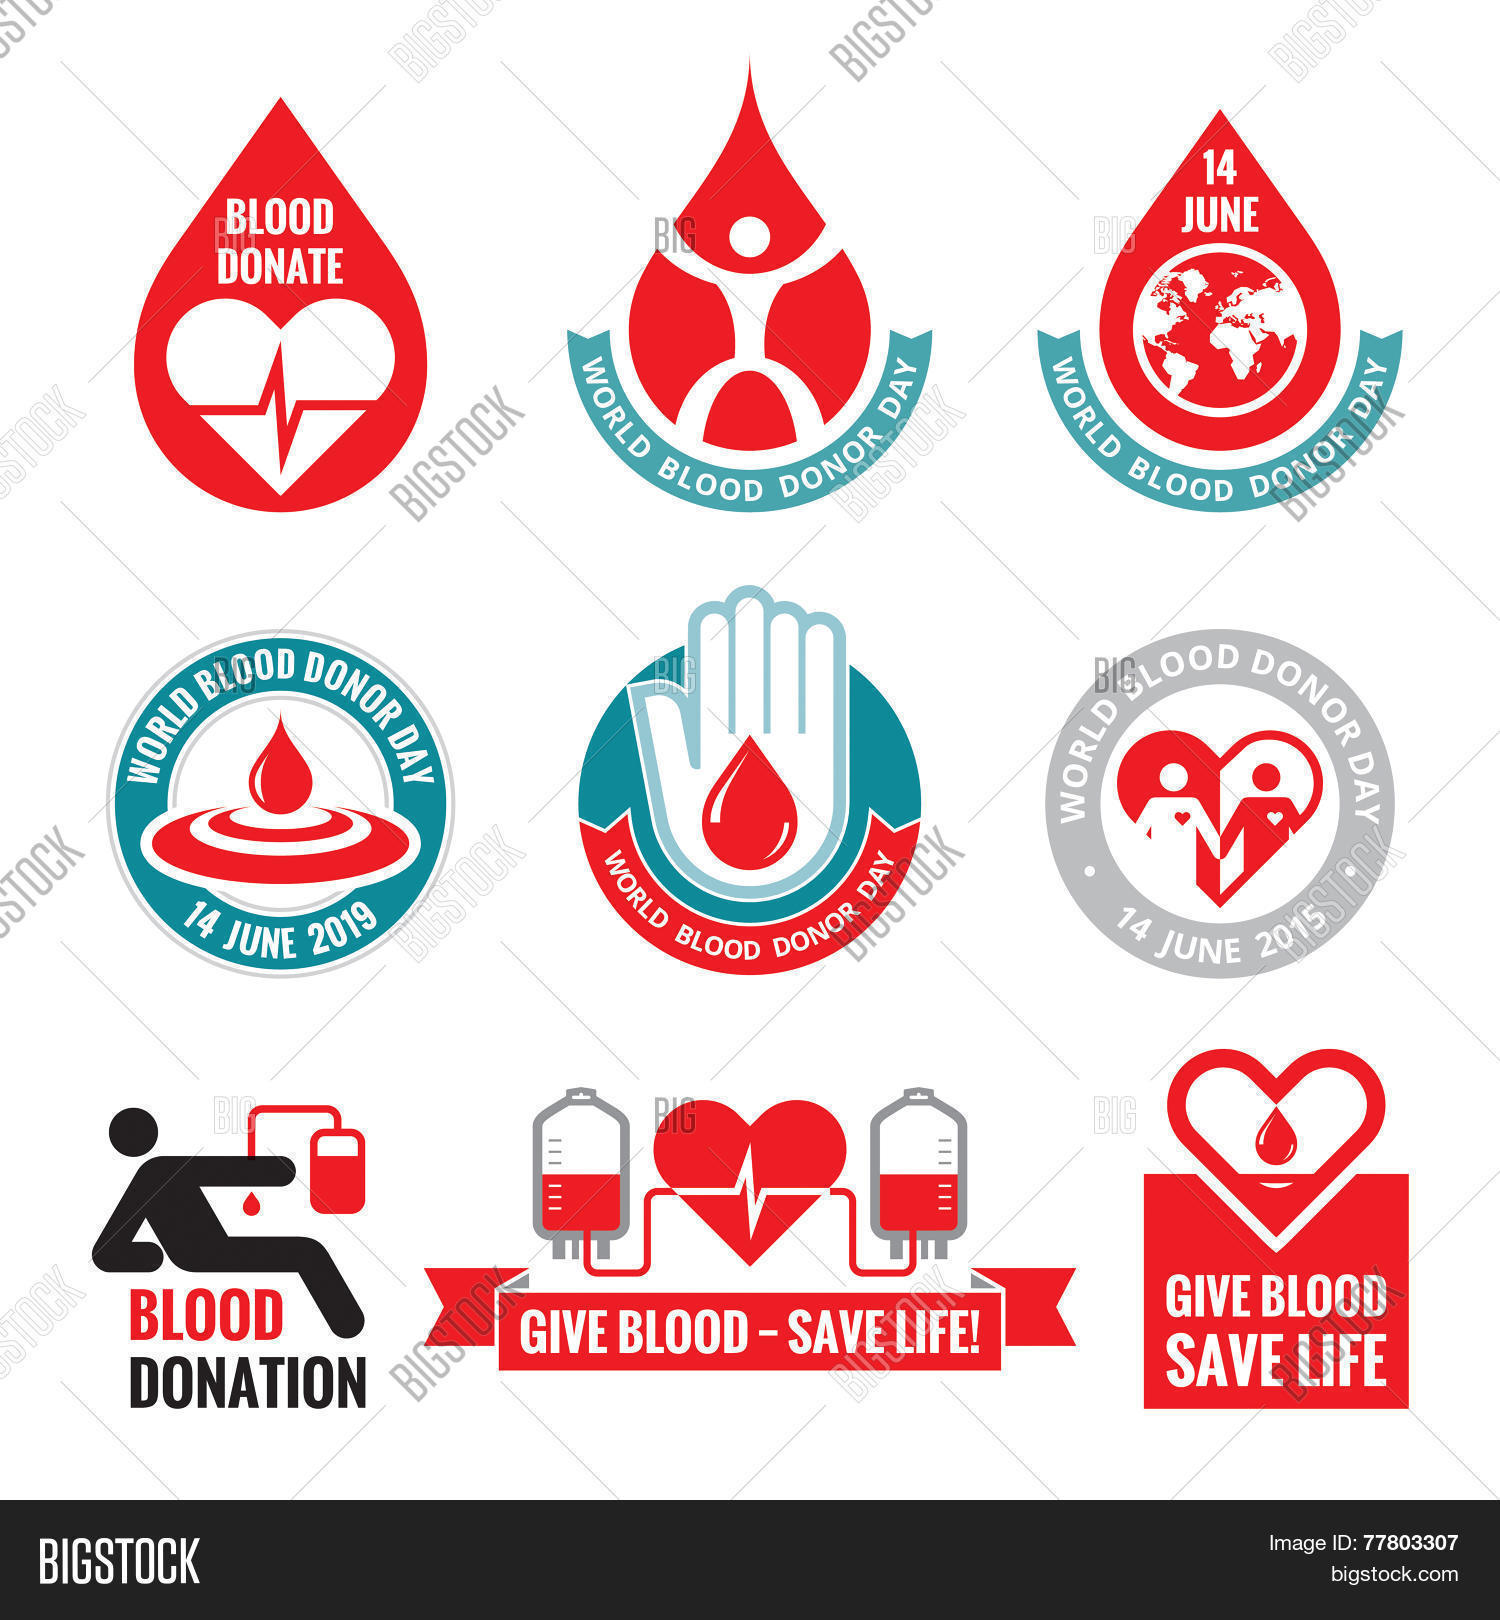 Blood donation vector logo vector photo bigstock blood donation vector logo badges collection world blood donor day 14 june buycottarizona